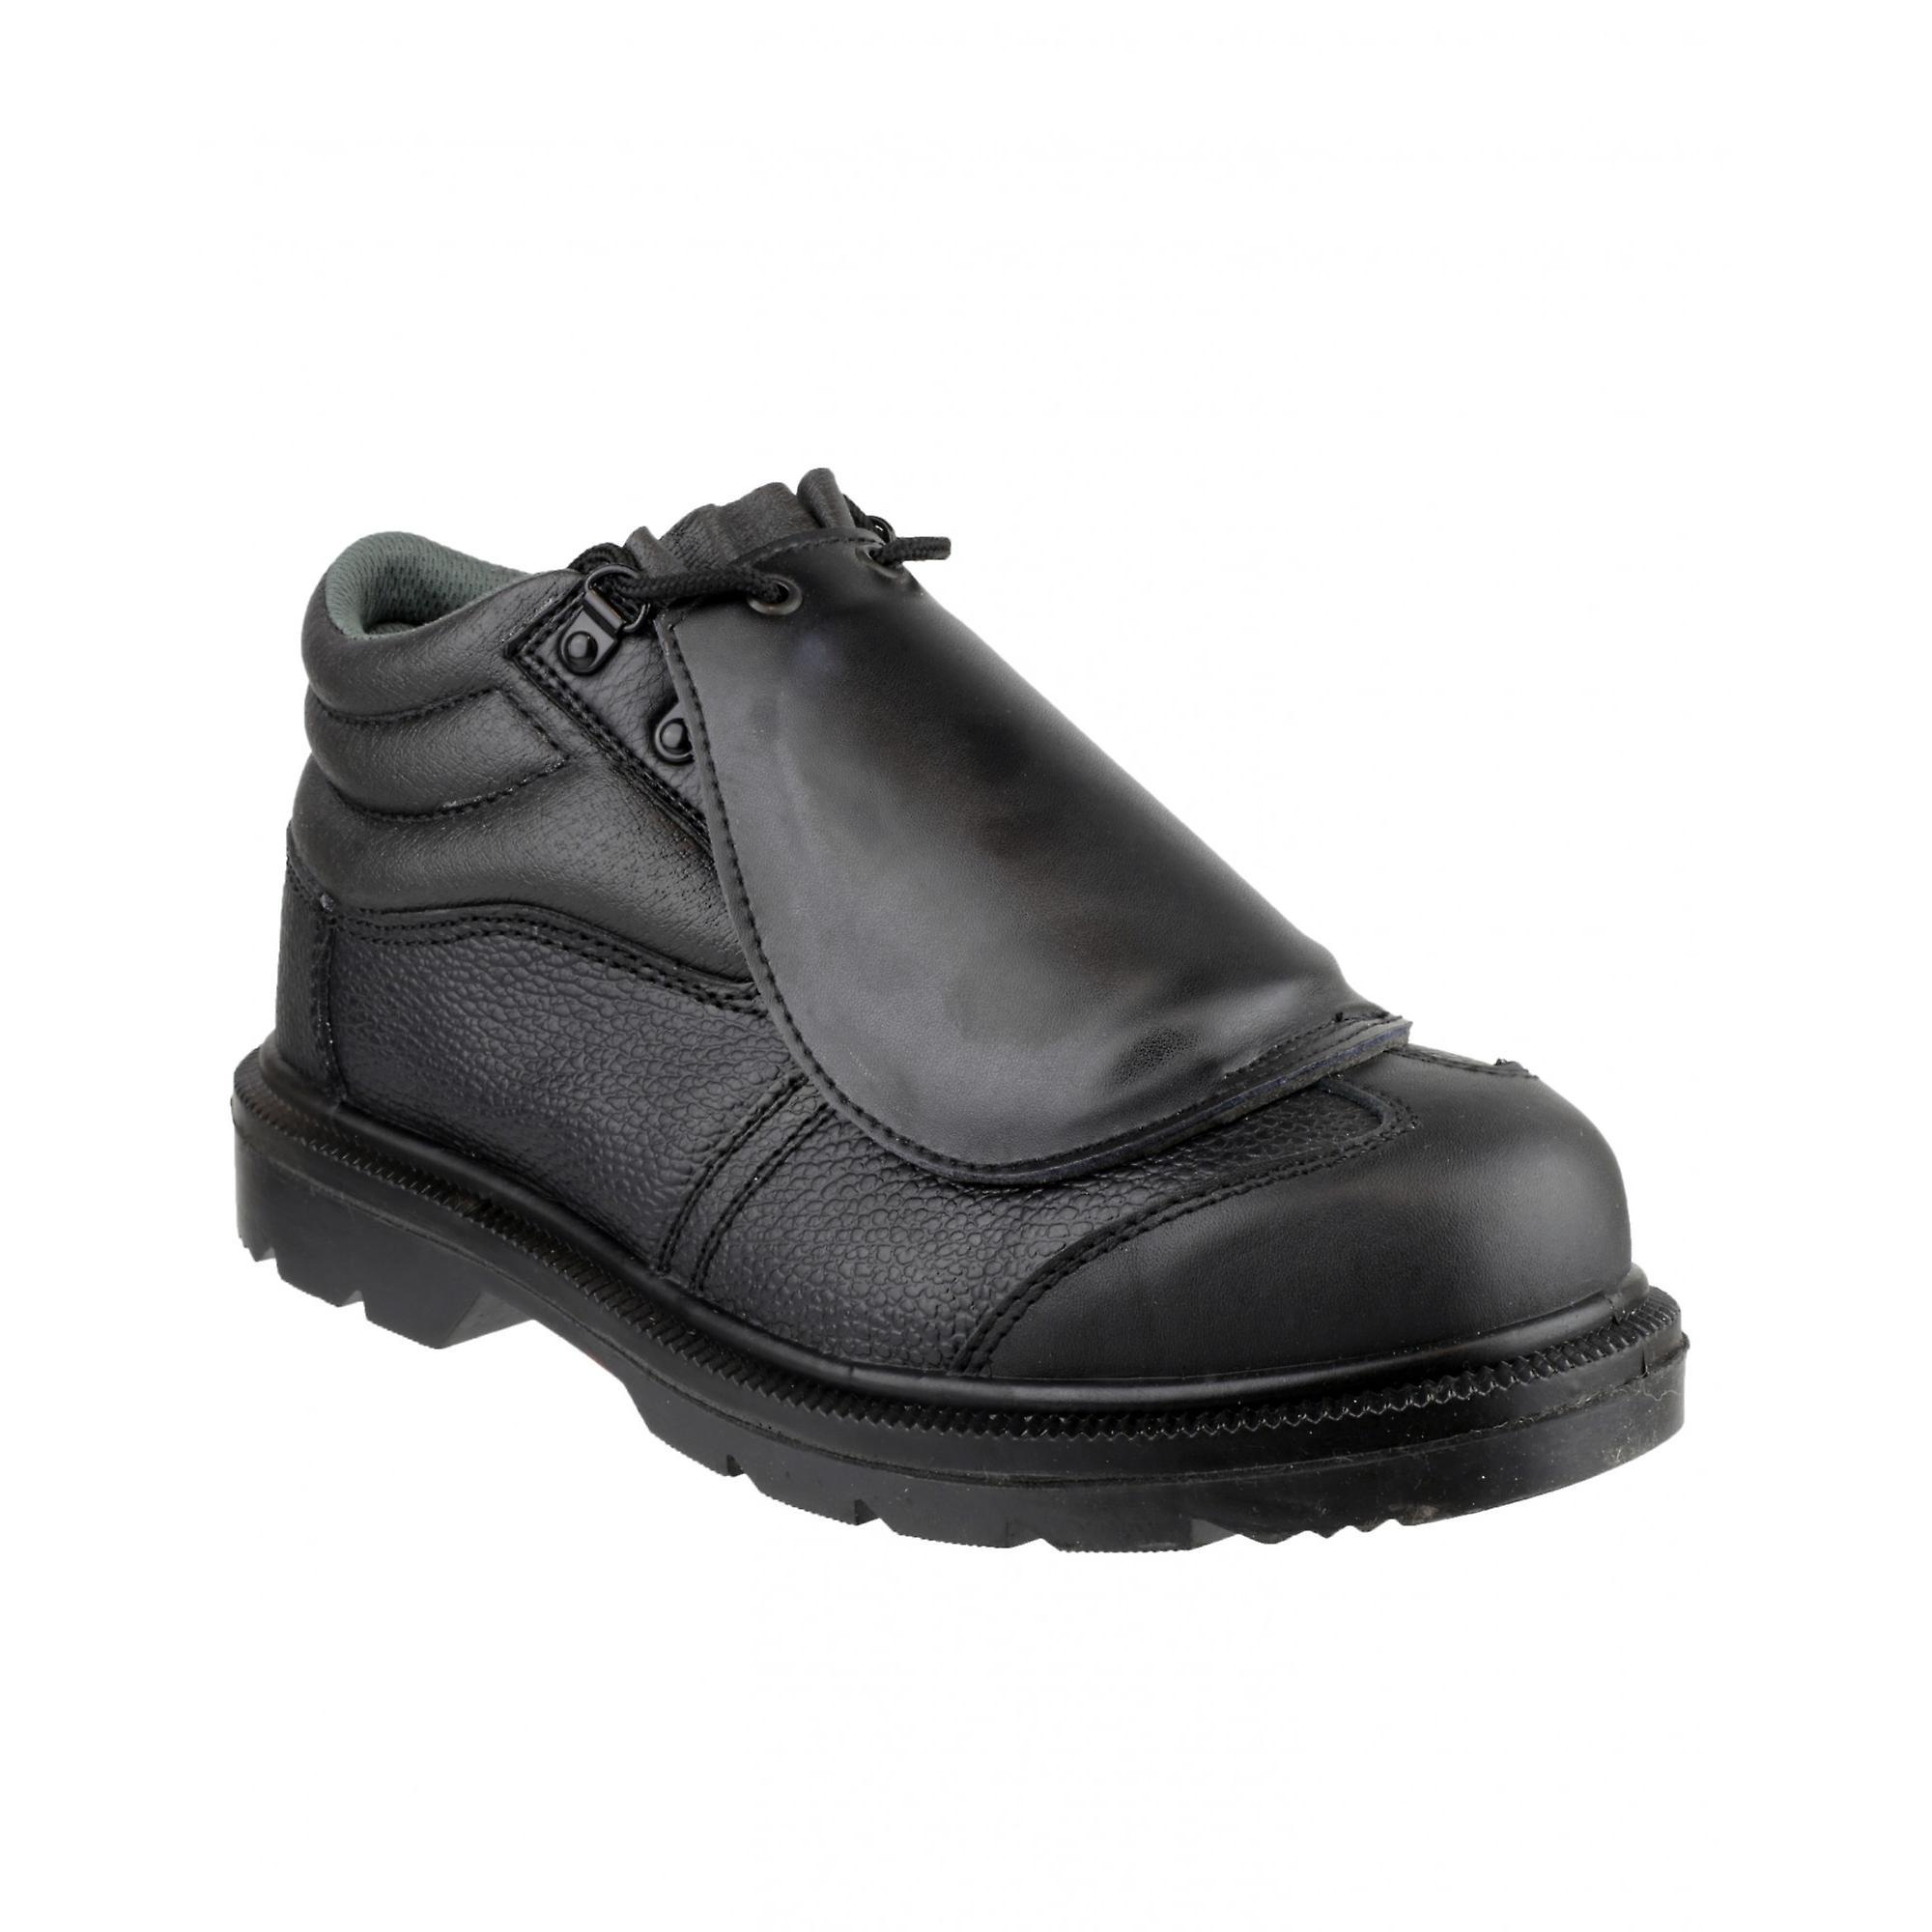 Centek S3 Metatarsal Boots Boots FS333 Mens HRO Black Safety rnARraqx